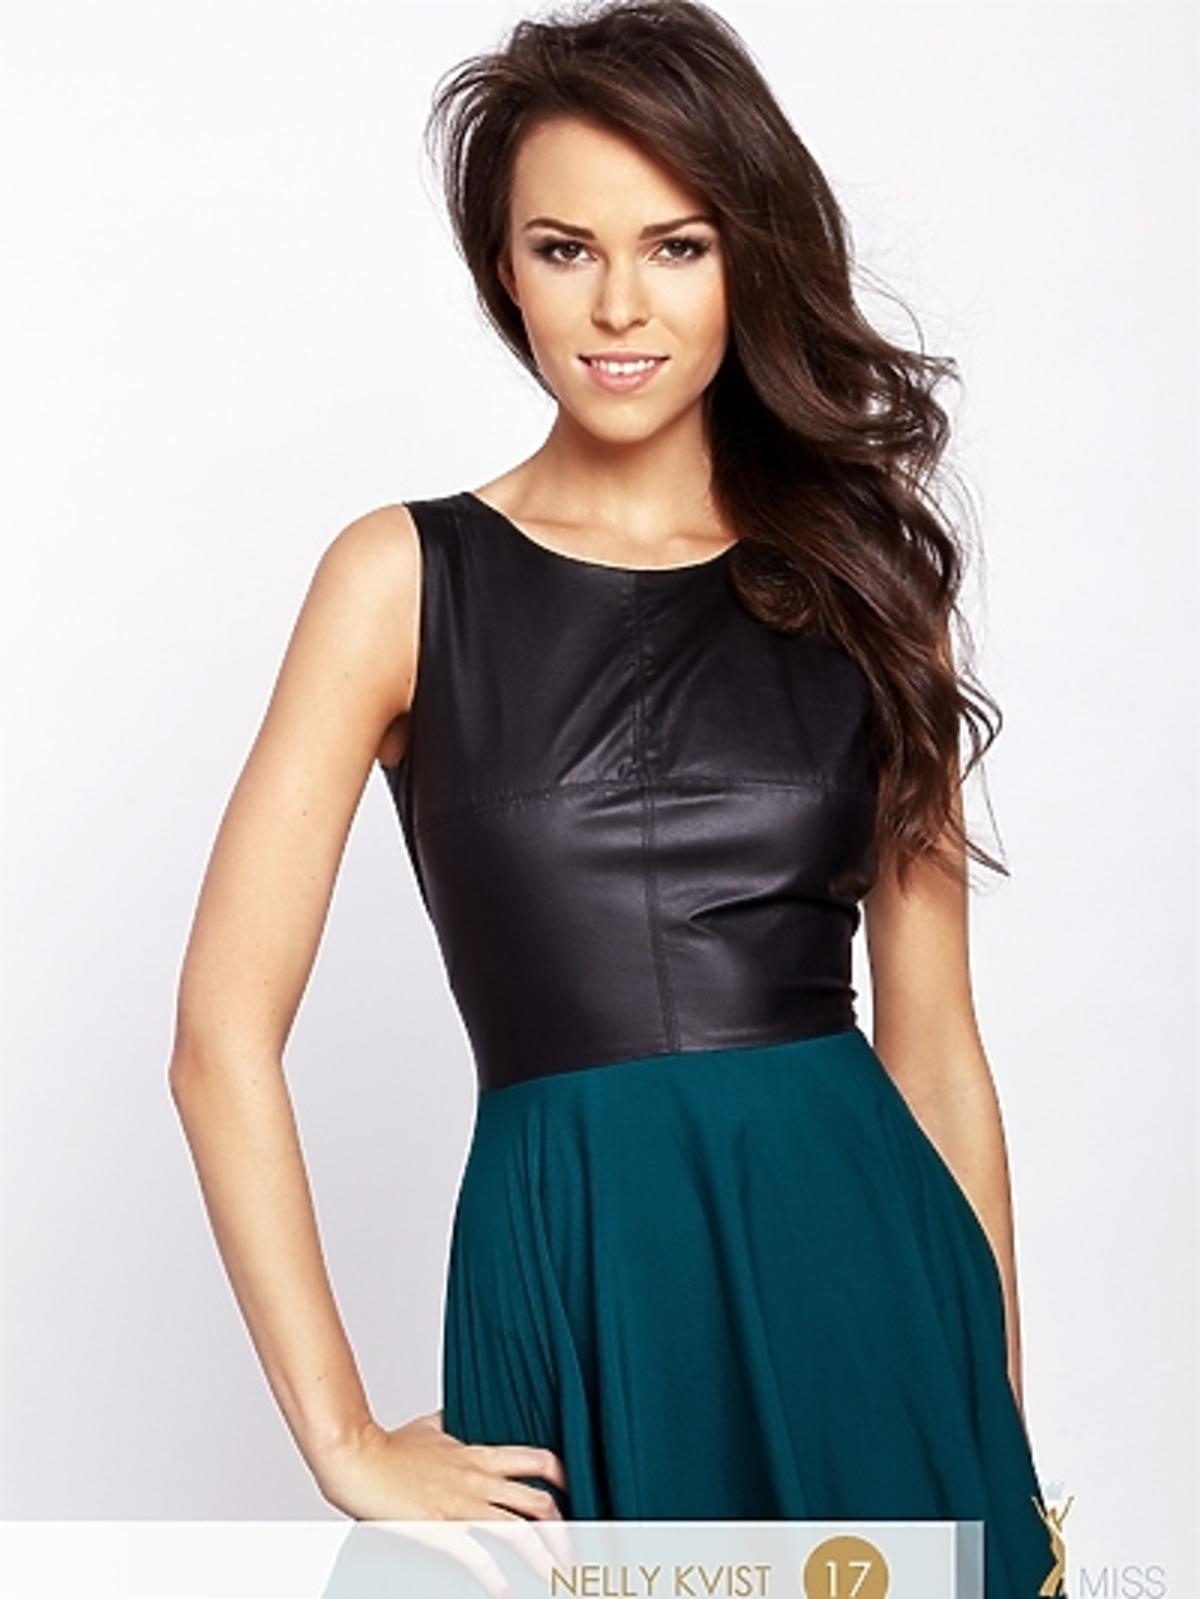 Nelly Kvist - kandydatka do tytułu Miss Polonia 2012